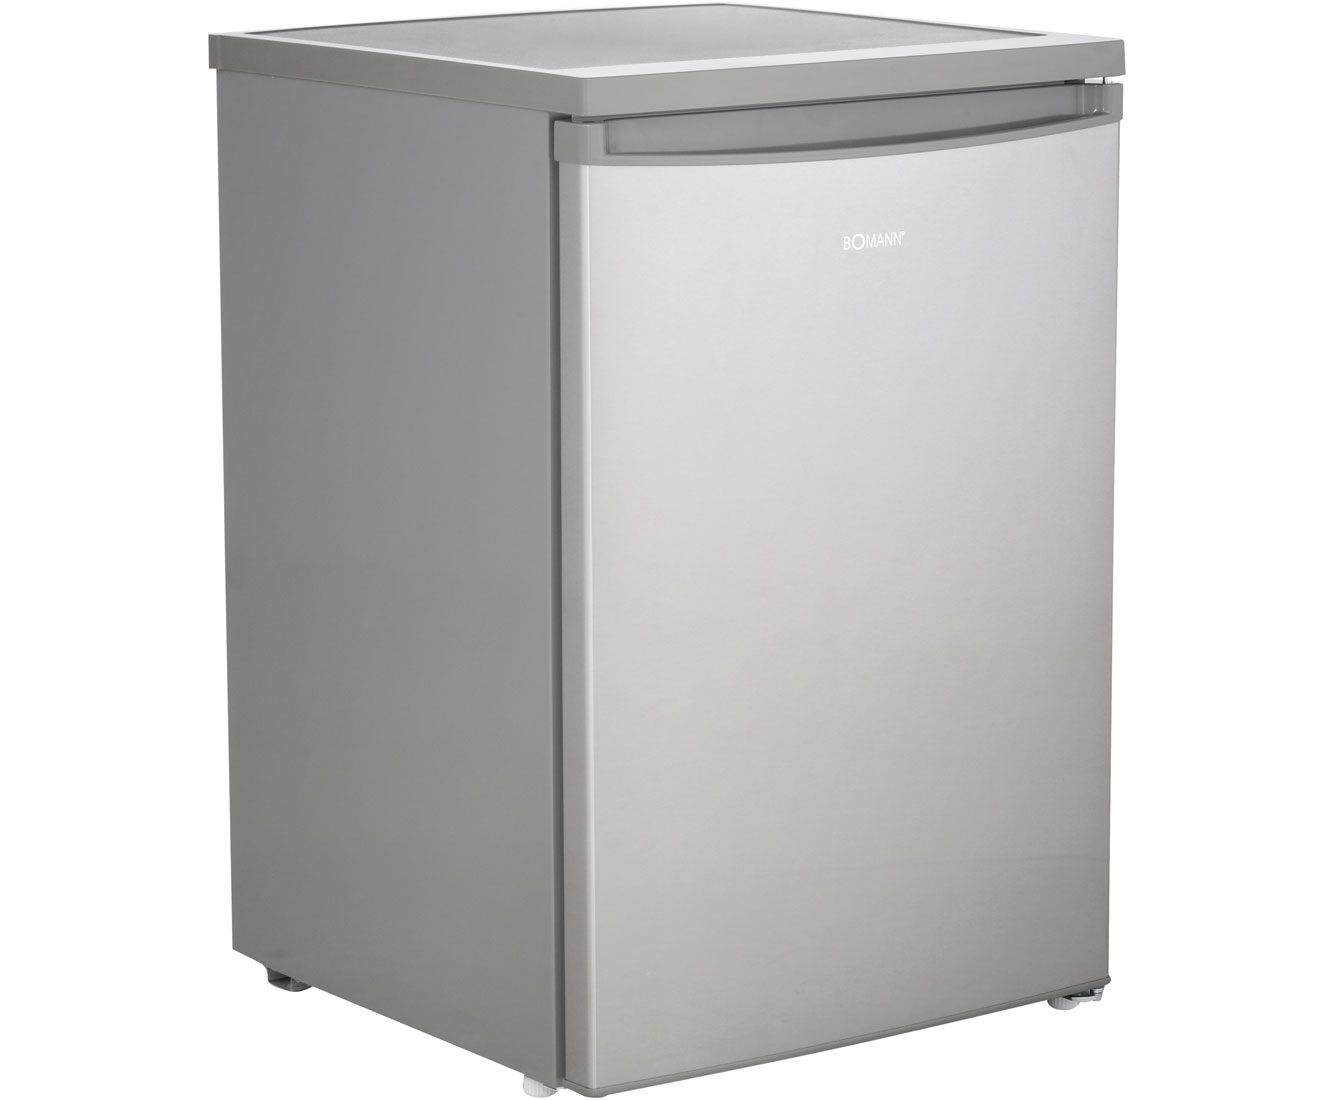 Bomann Kühlschrank Wird Heiß : Bomann kühlschrank aufstellen bomann kg spektrum a d a